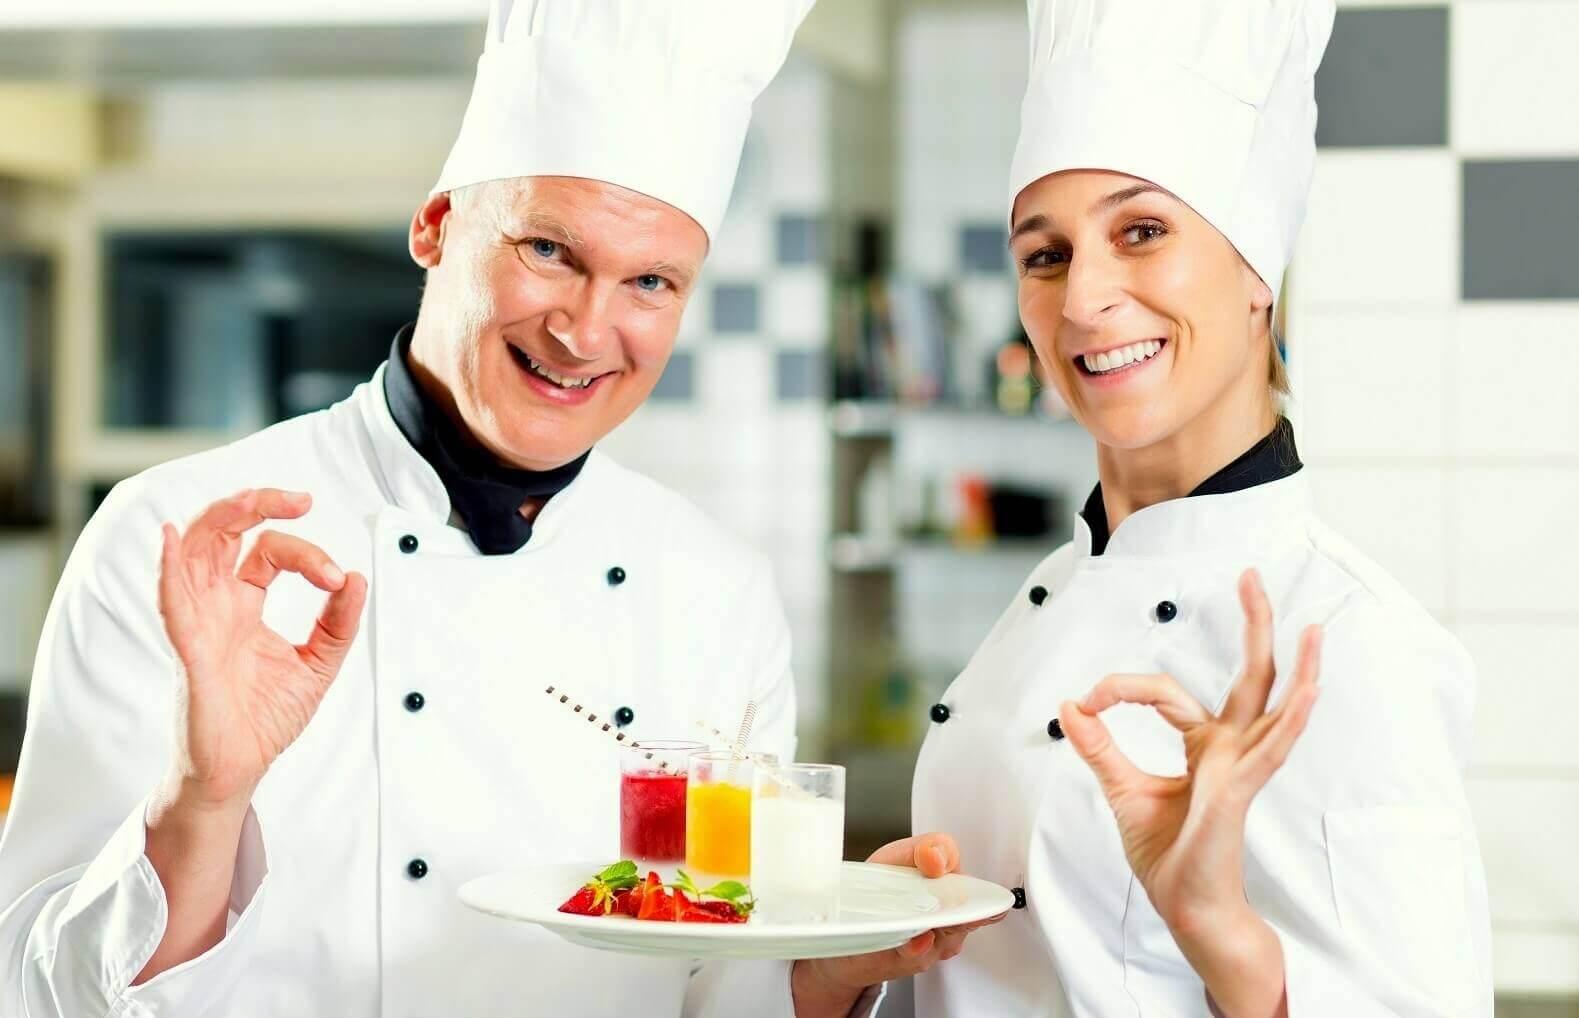 Warsztaty kulinarne - Warszawa